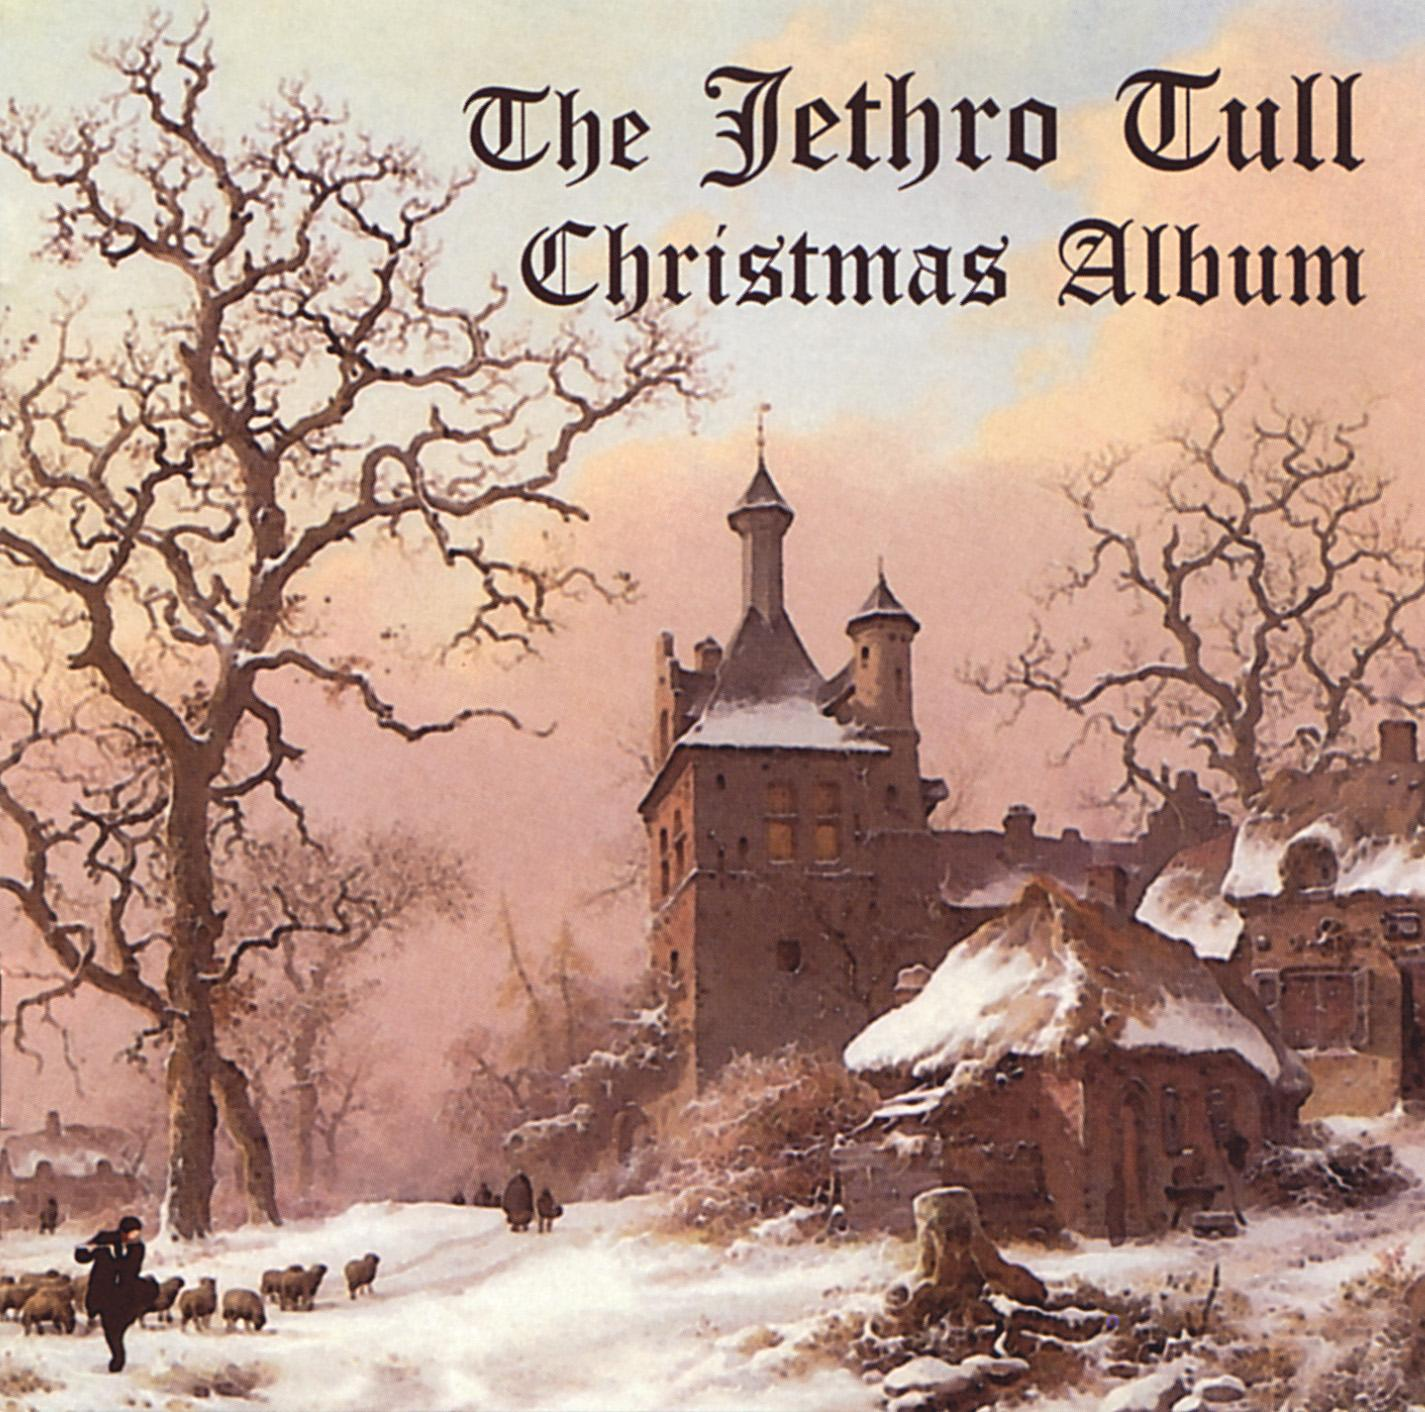 egroj world: Jethro Tull • The Jethro Tull Christmas Album